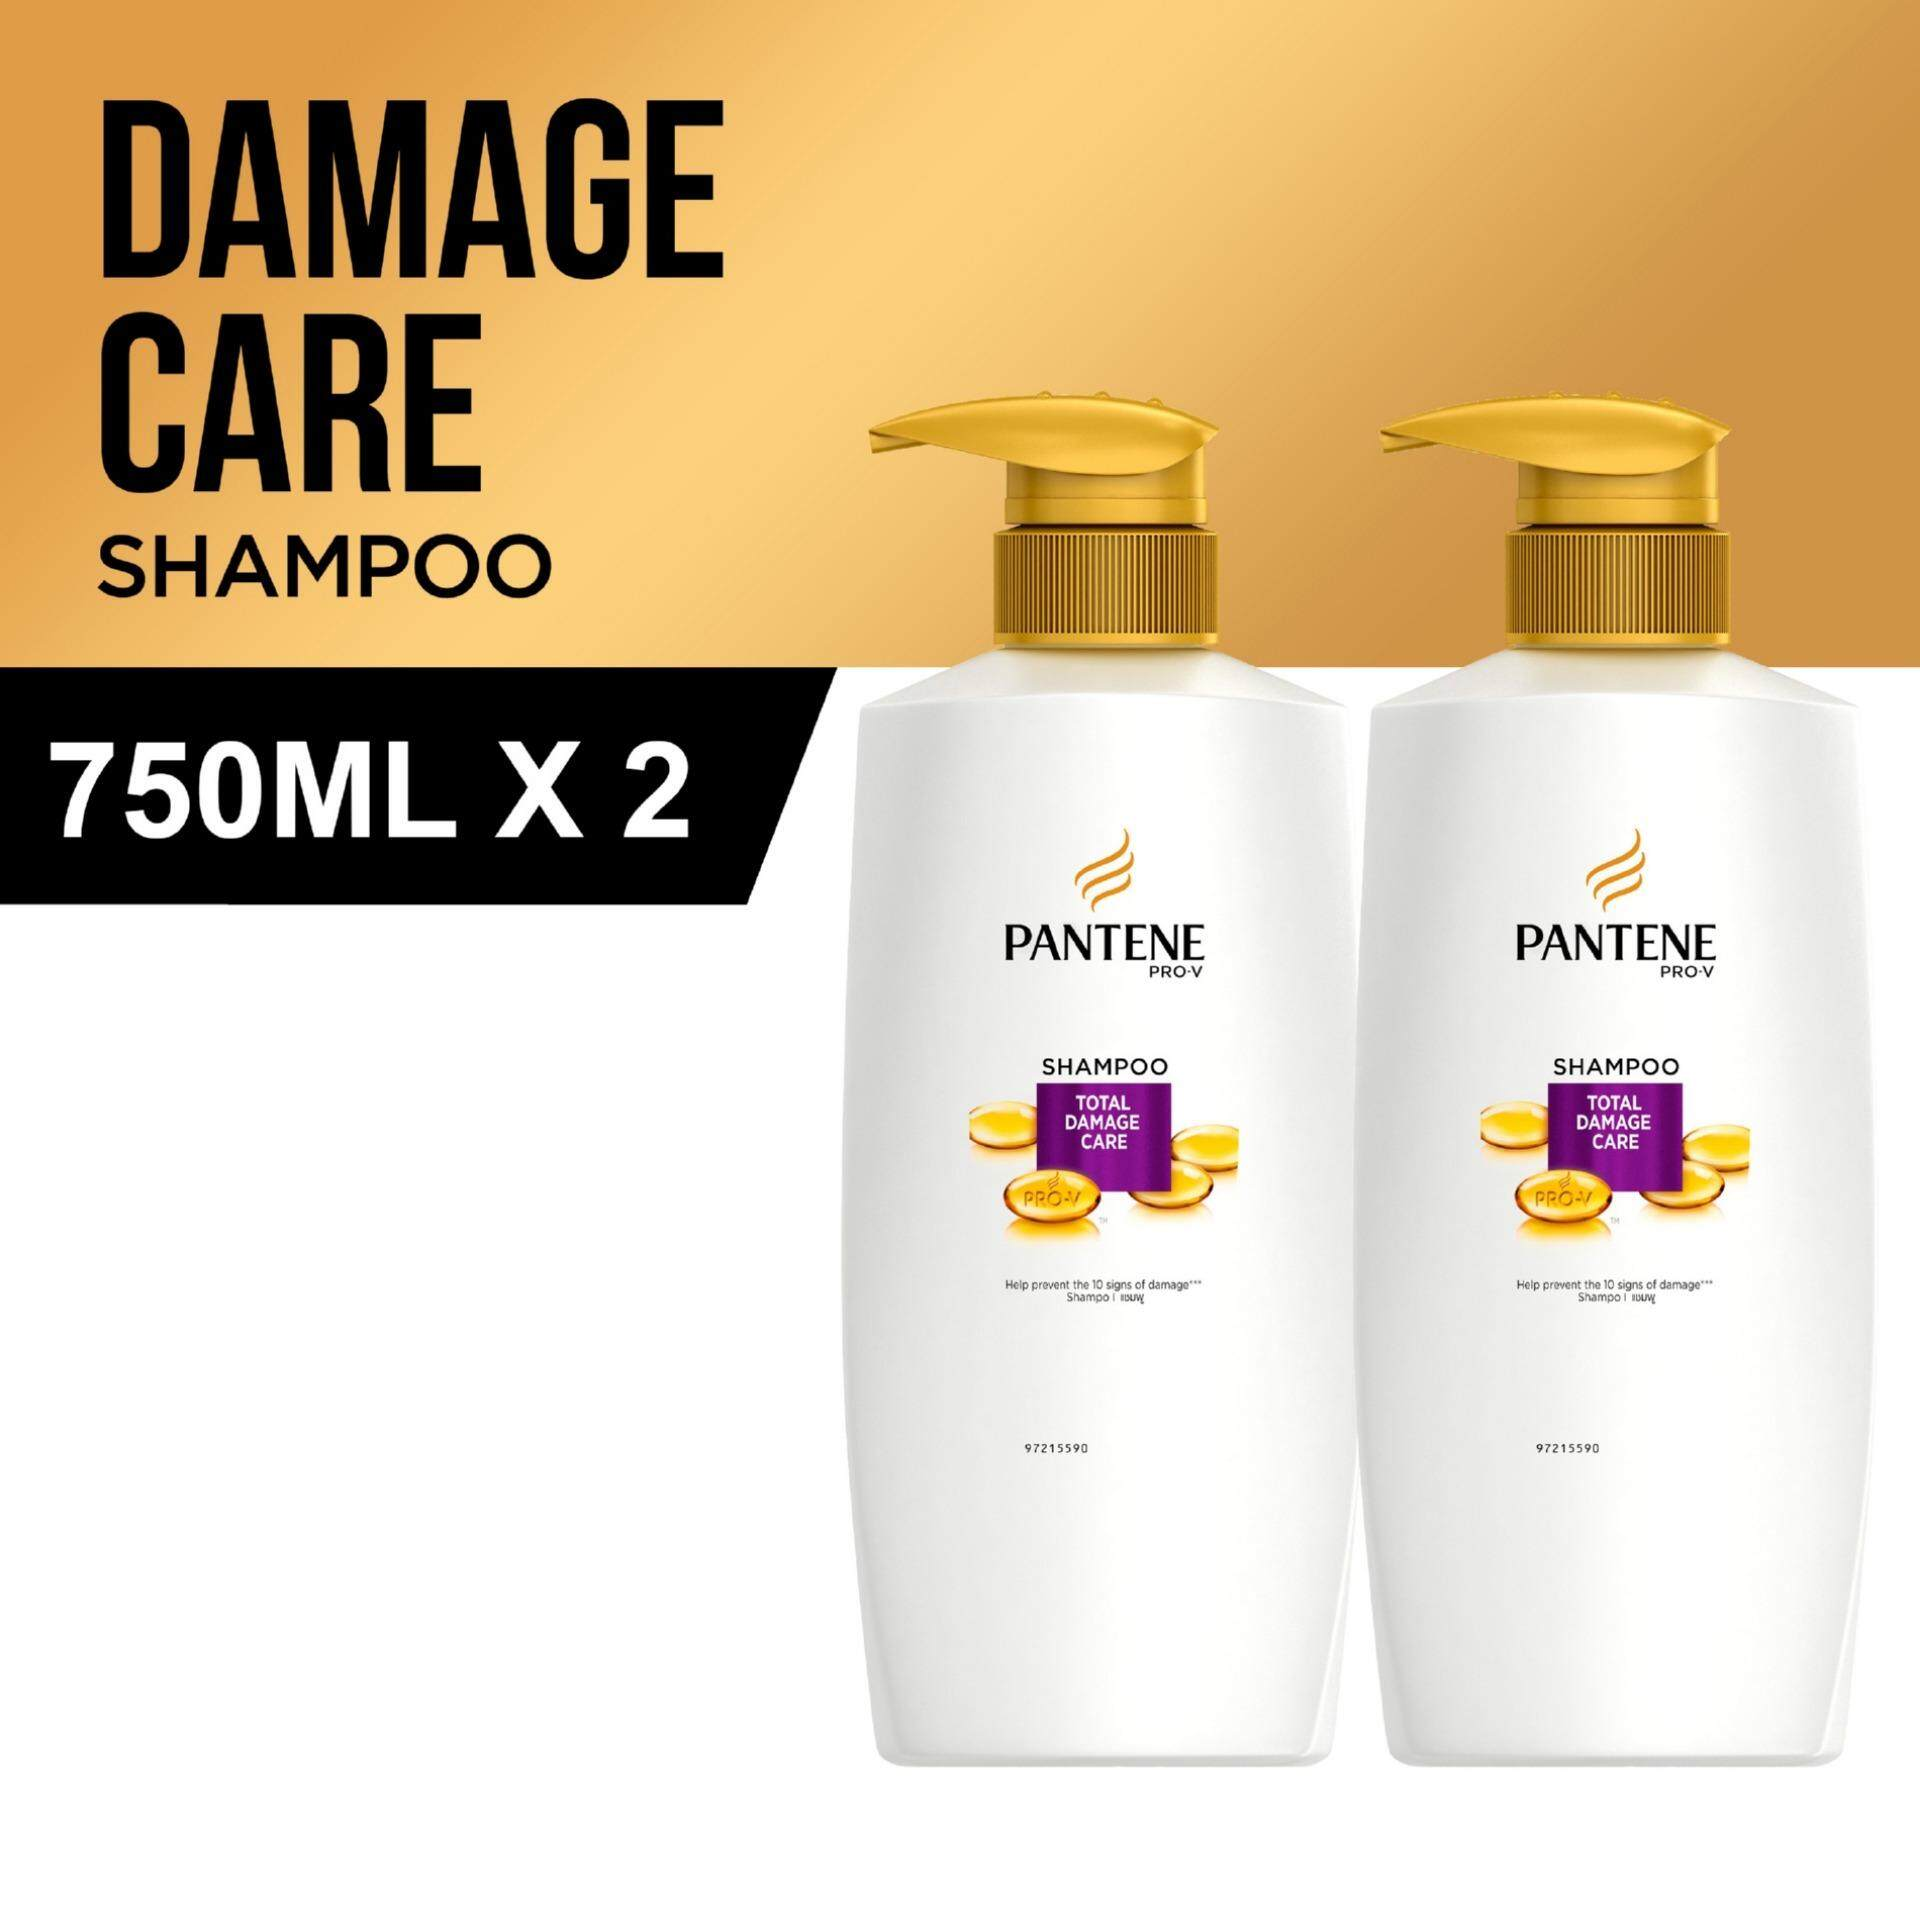 Pantene Pro-V Total Damage Care Shampoo 750ml [Bundle of 2]